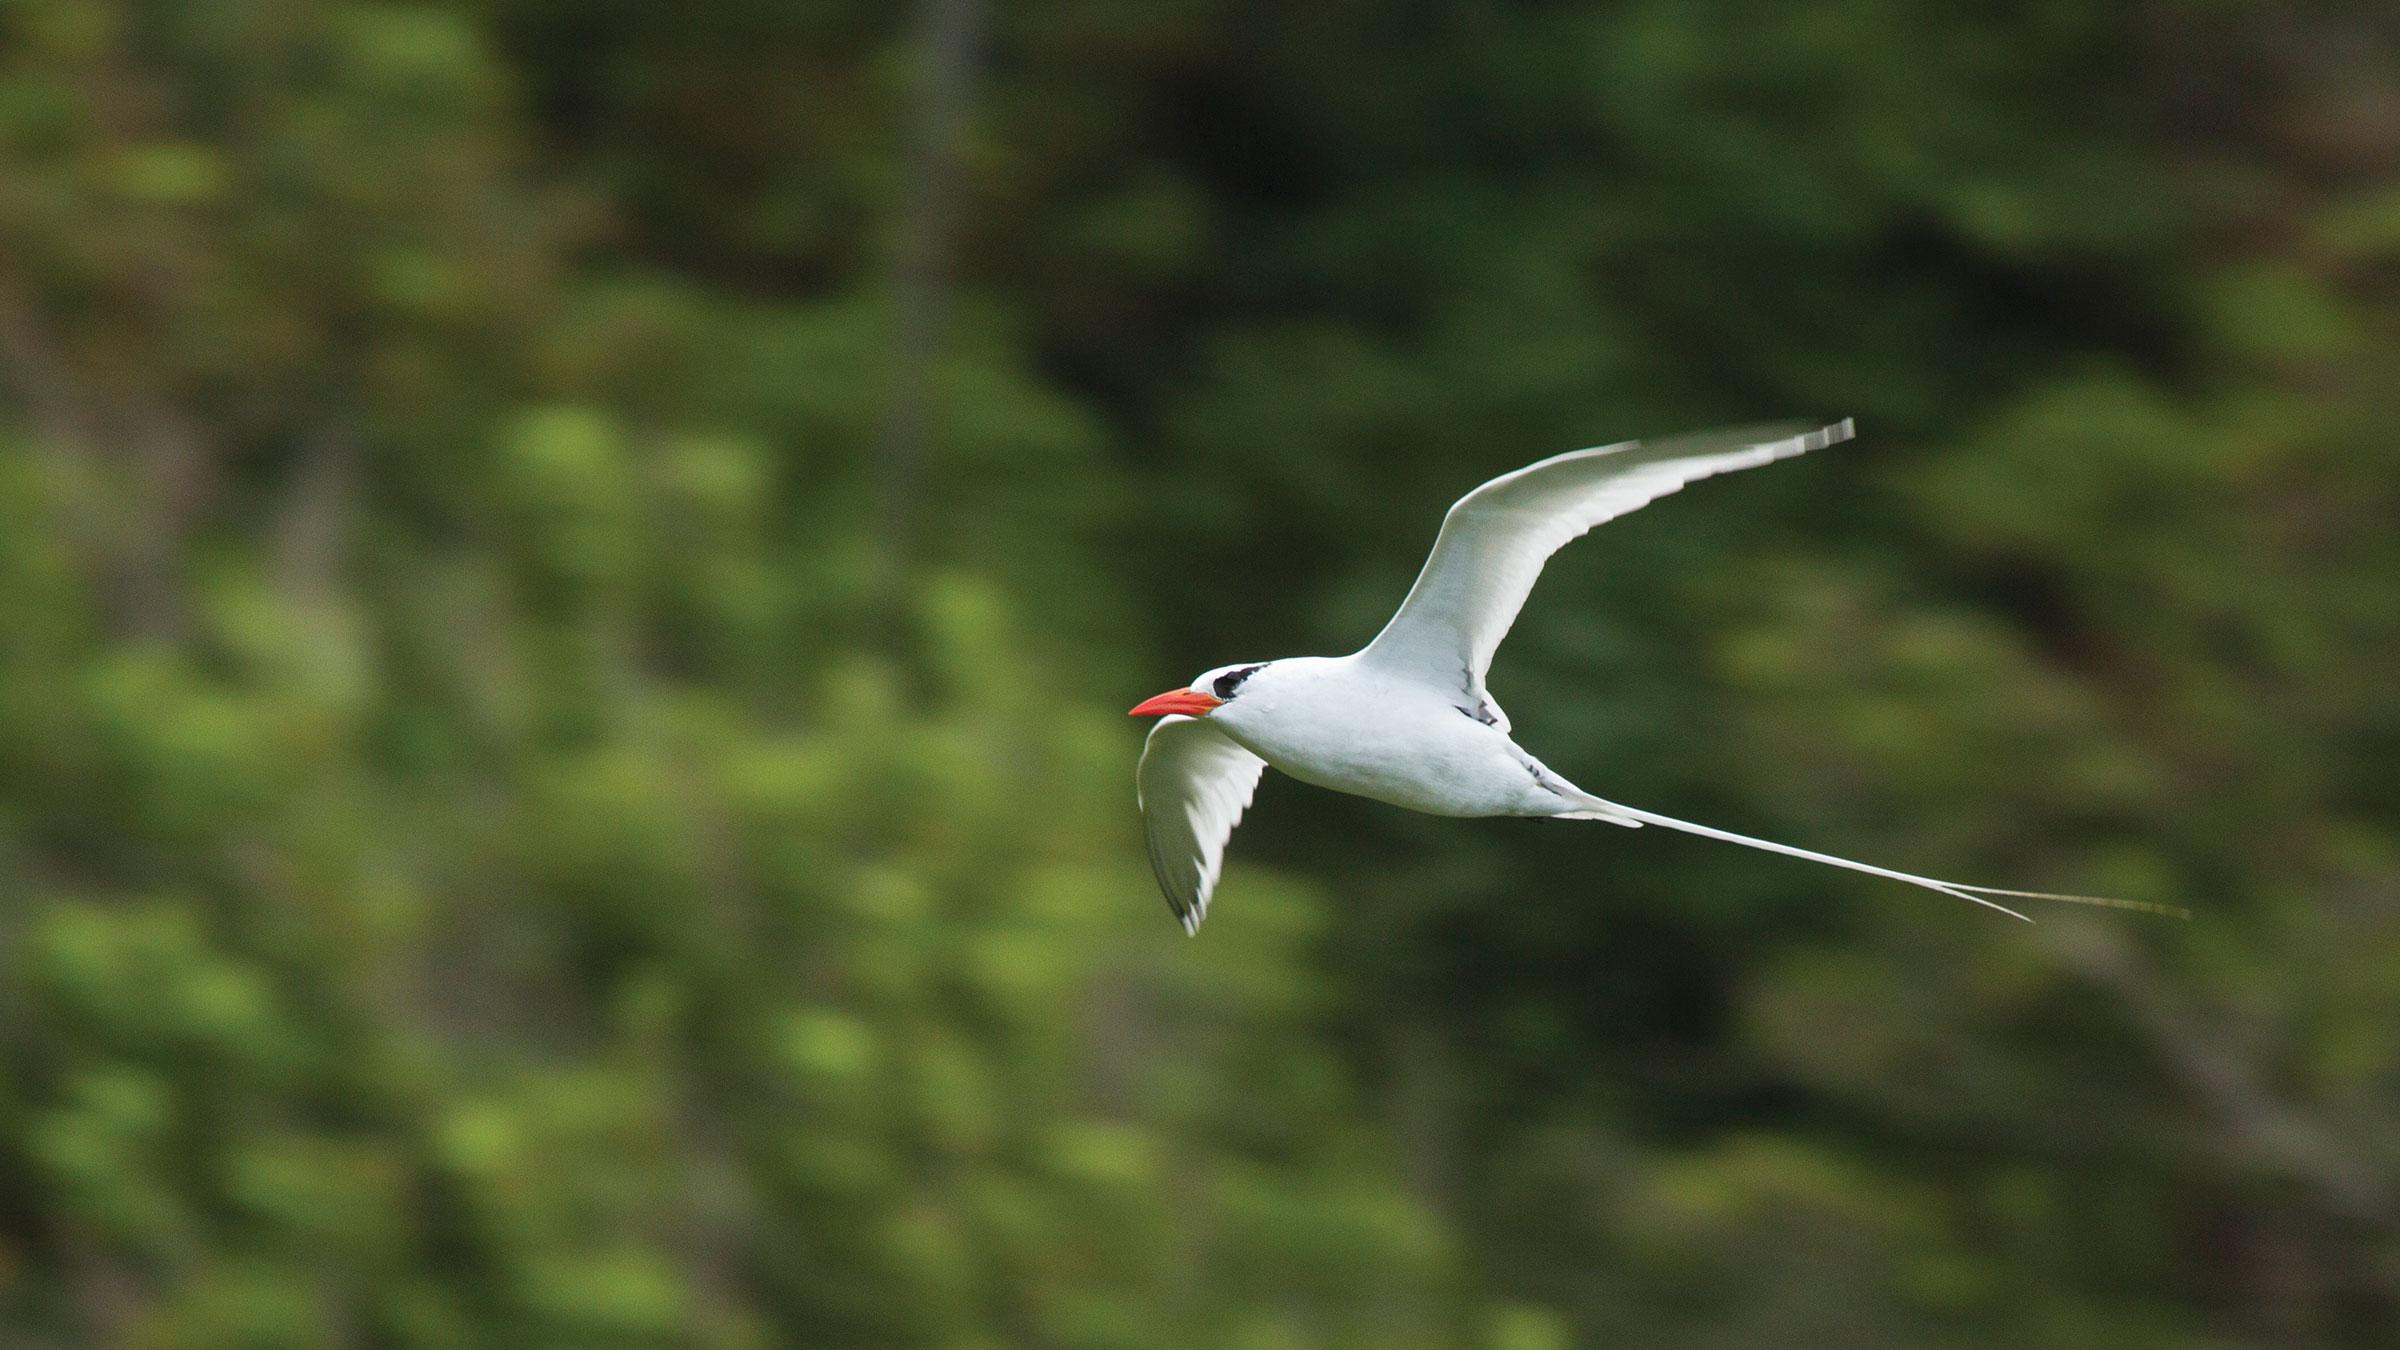 Red-billed Tropicbird. Faraaz Abdool